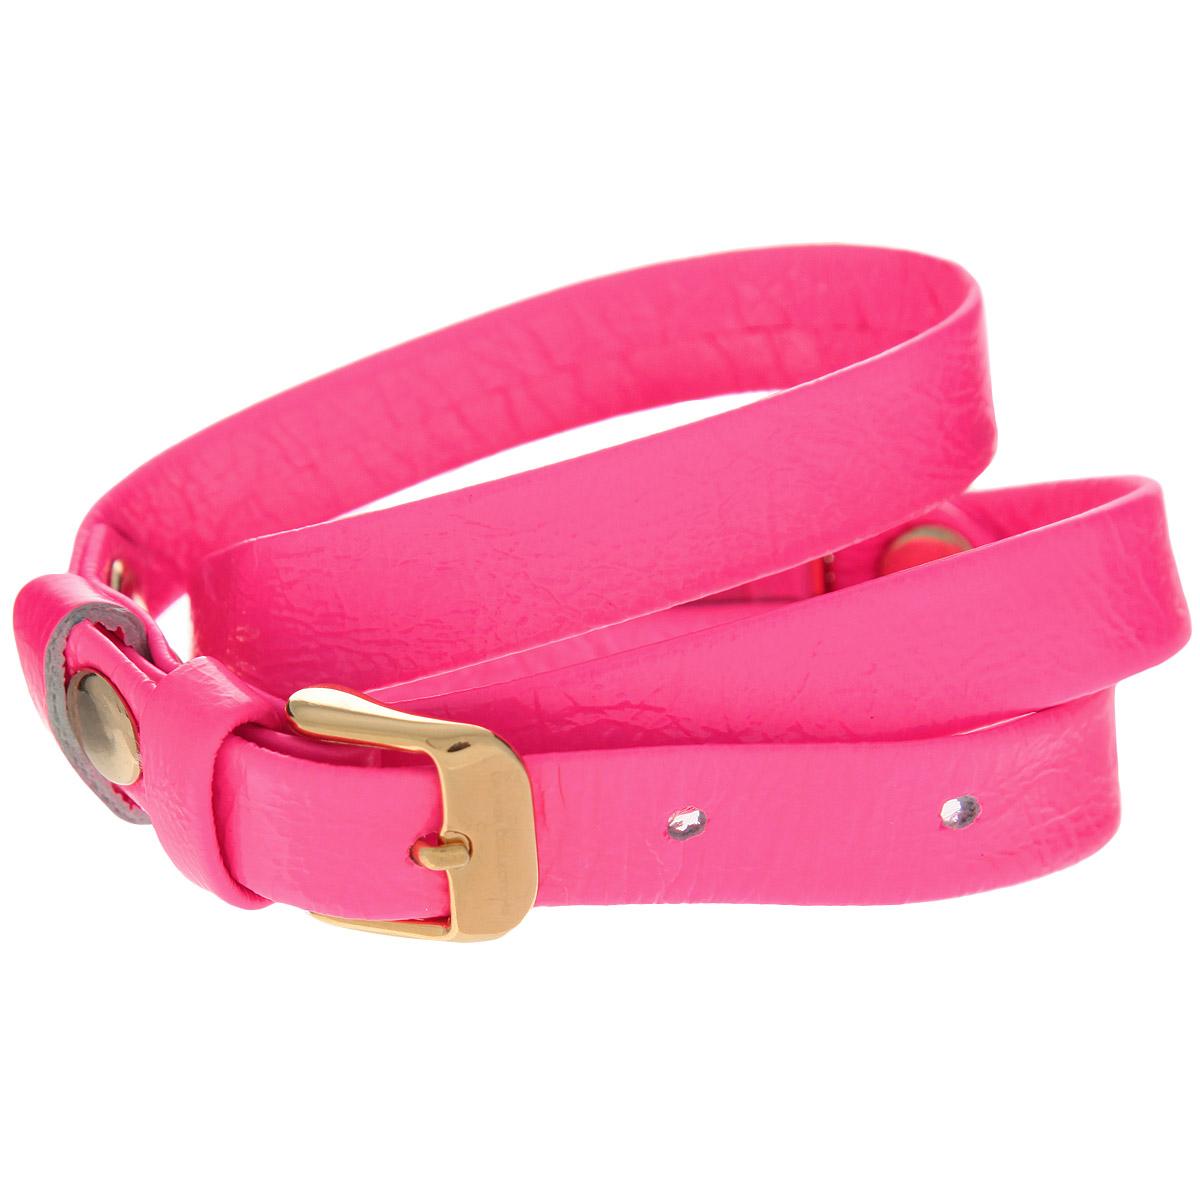 "Часы наручные женские La Mer Collections ""Simple Neon Pink"". LMSTW 1002x ( LMSTW 1002x )"